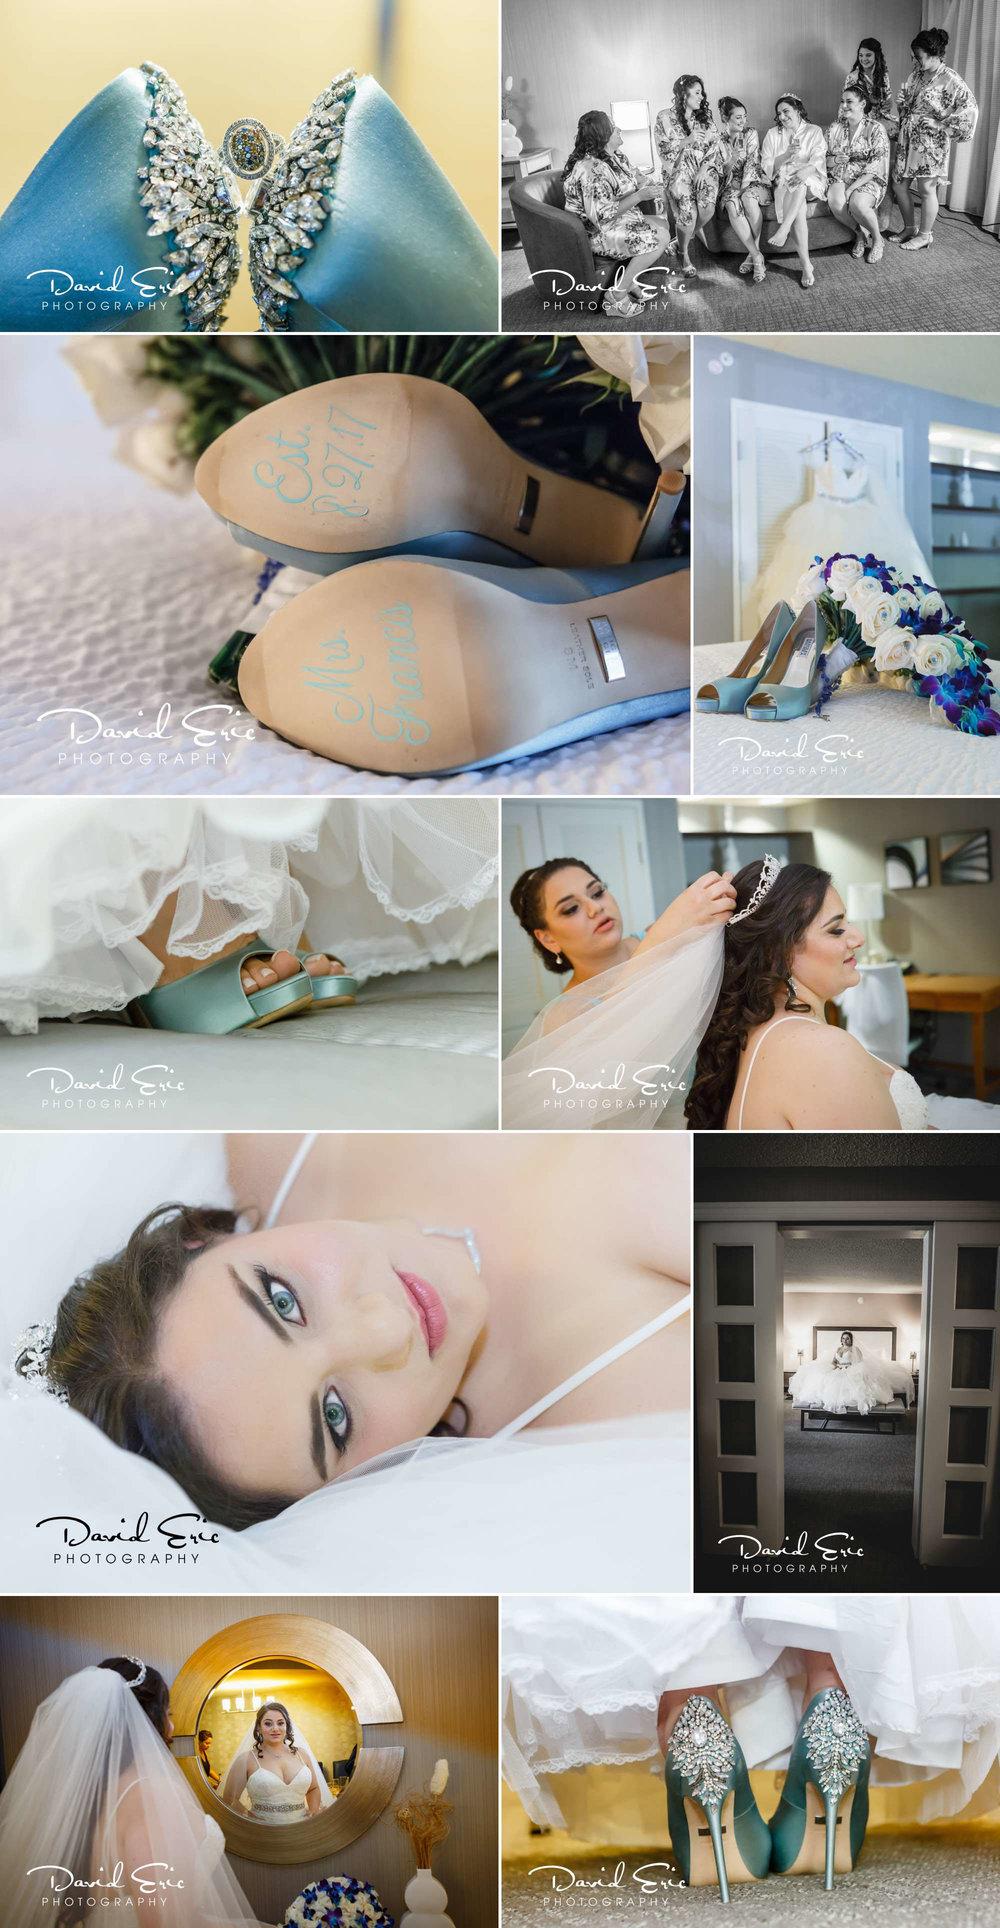 Bride getting ready for her wedding at seasons washington twp nj, here are photos of wedding shoe wedding dress veil and wedding flowers